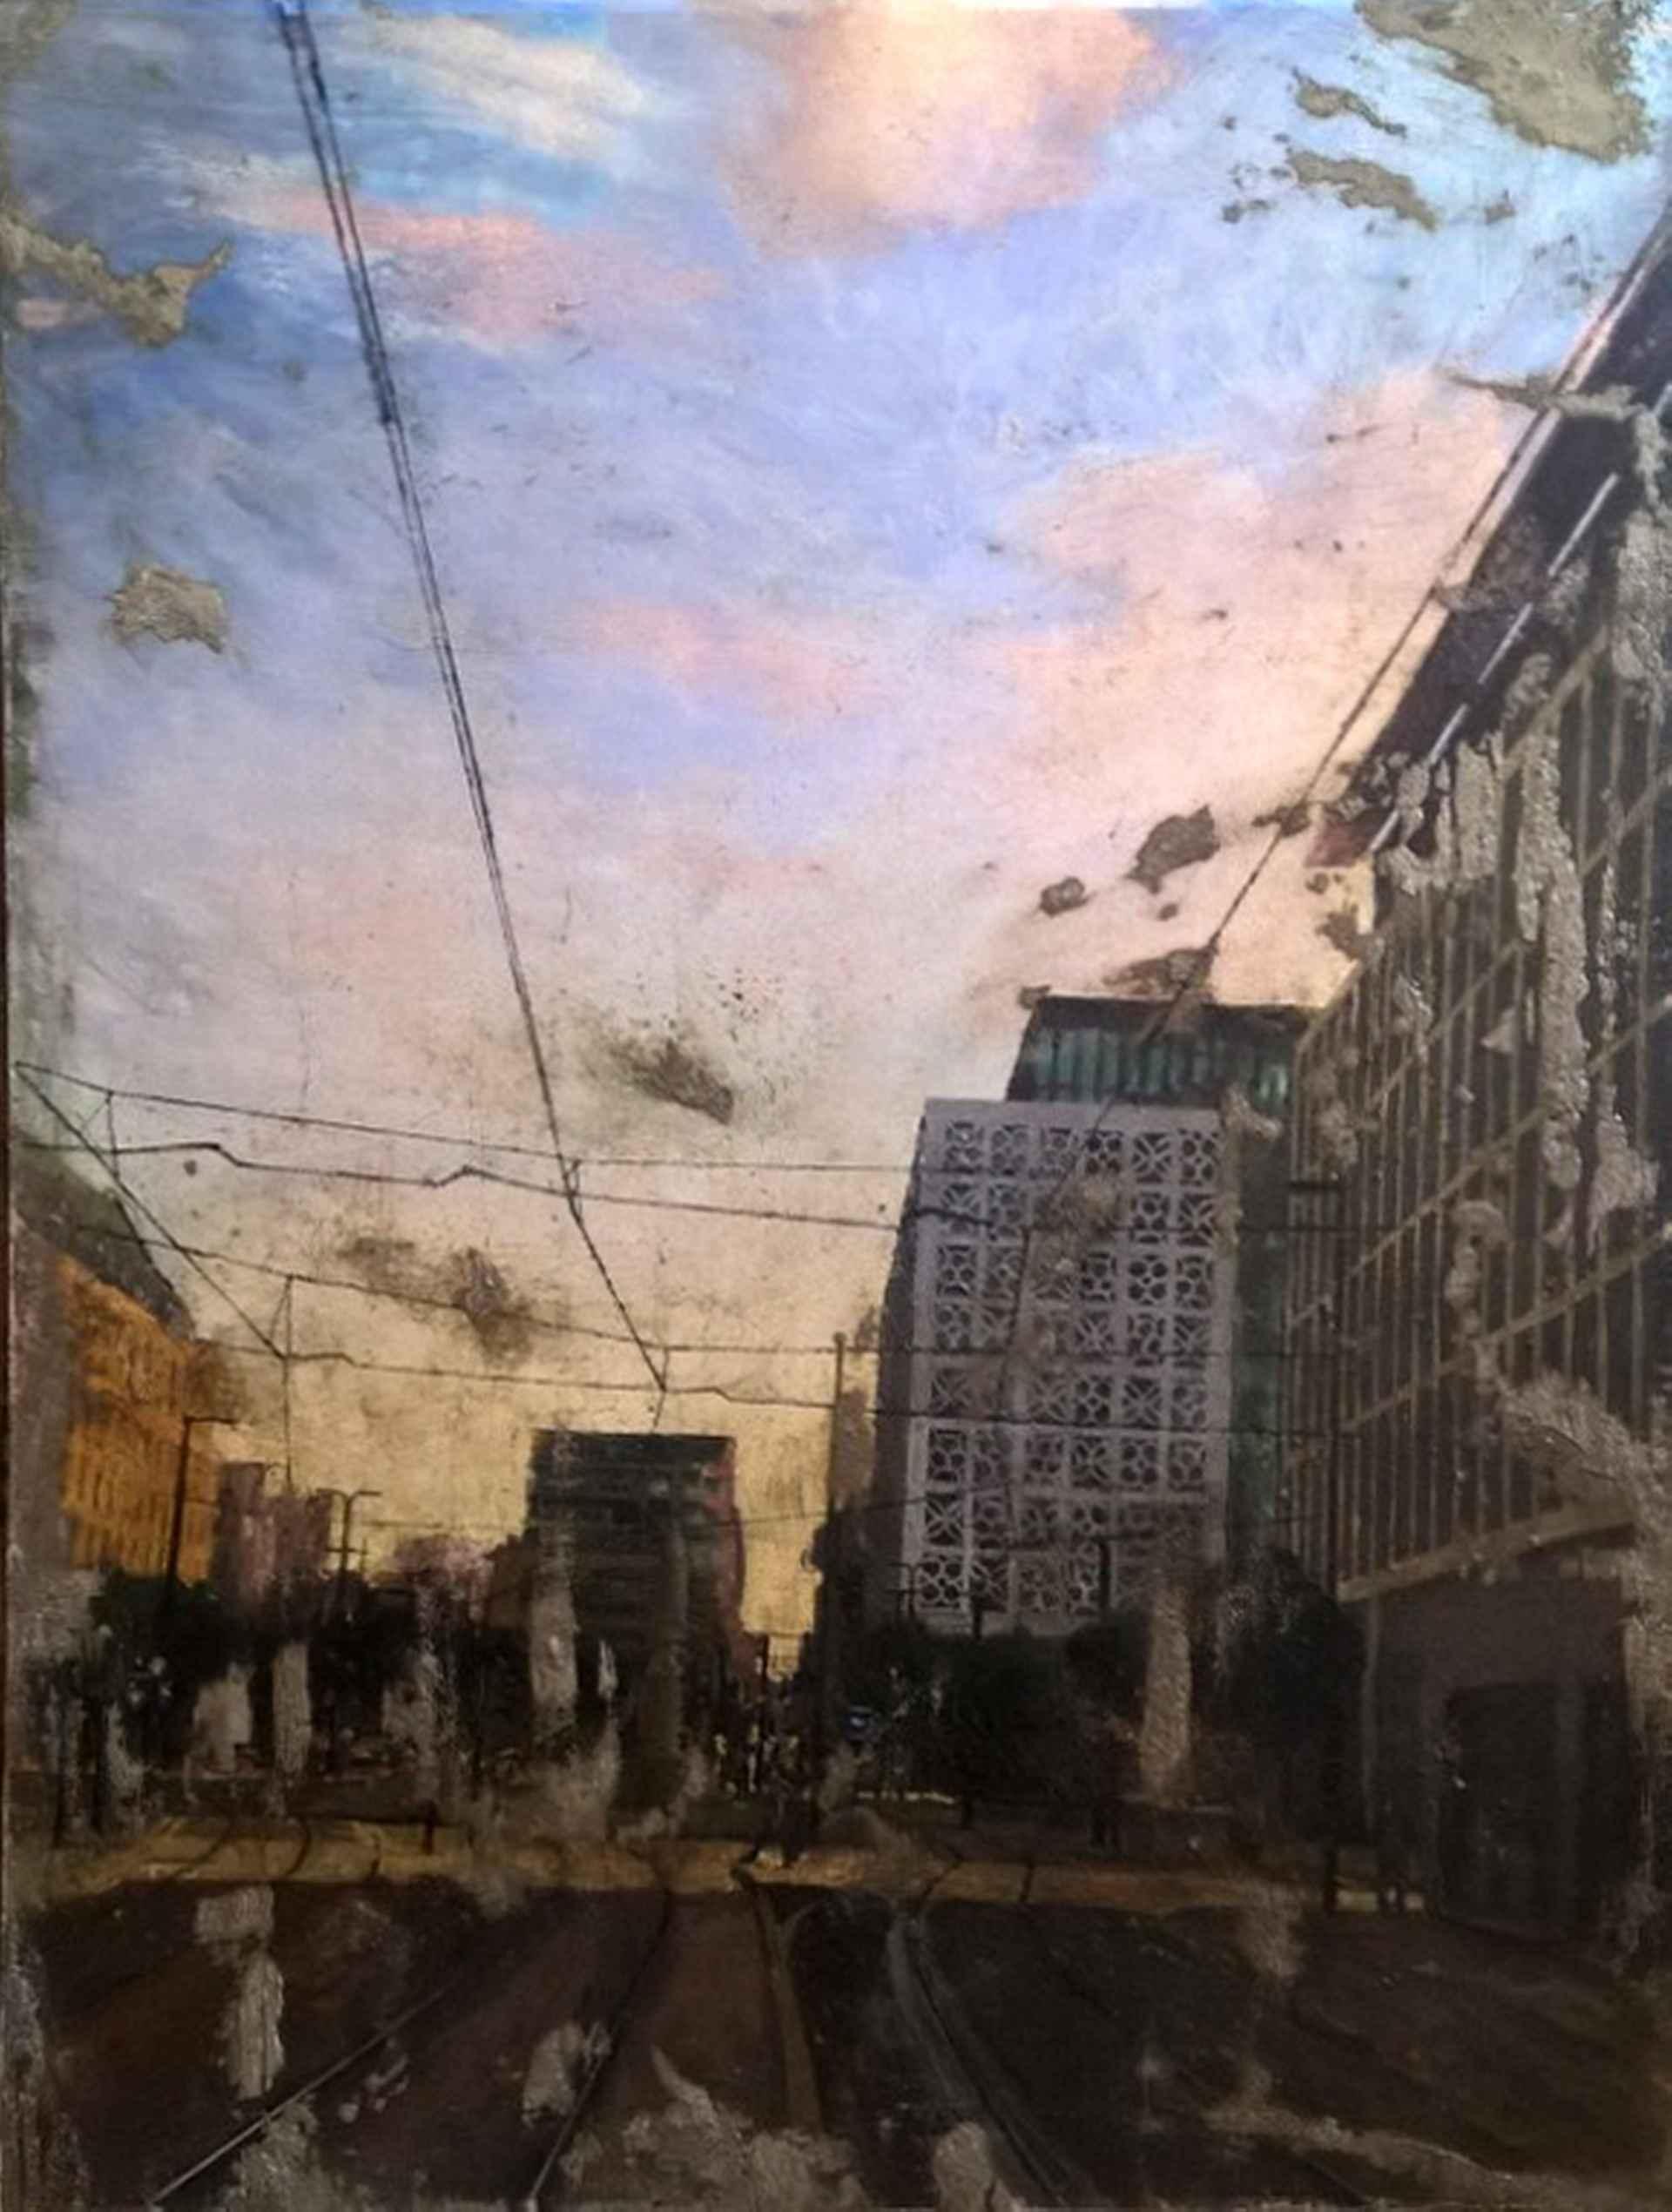 St Peter's Square Evening Light by Tim Garner